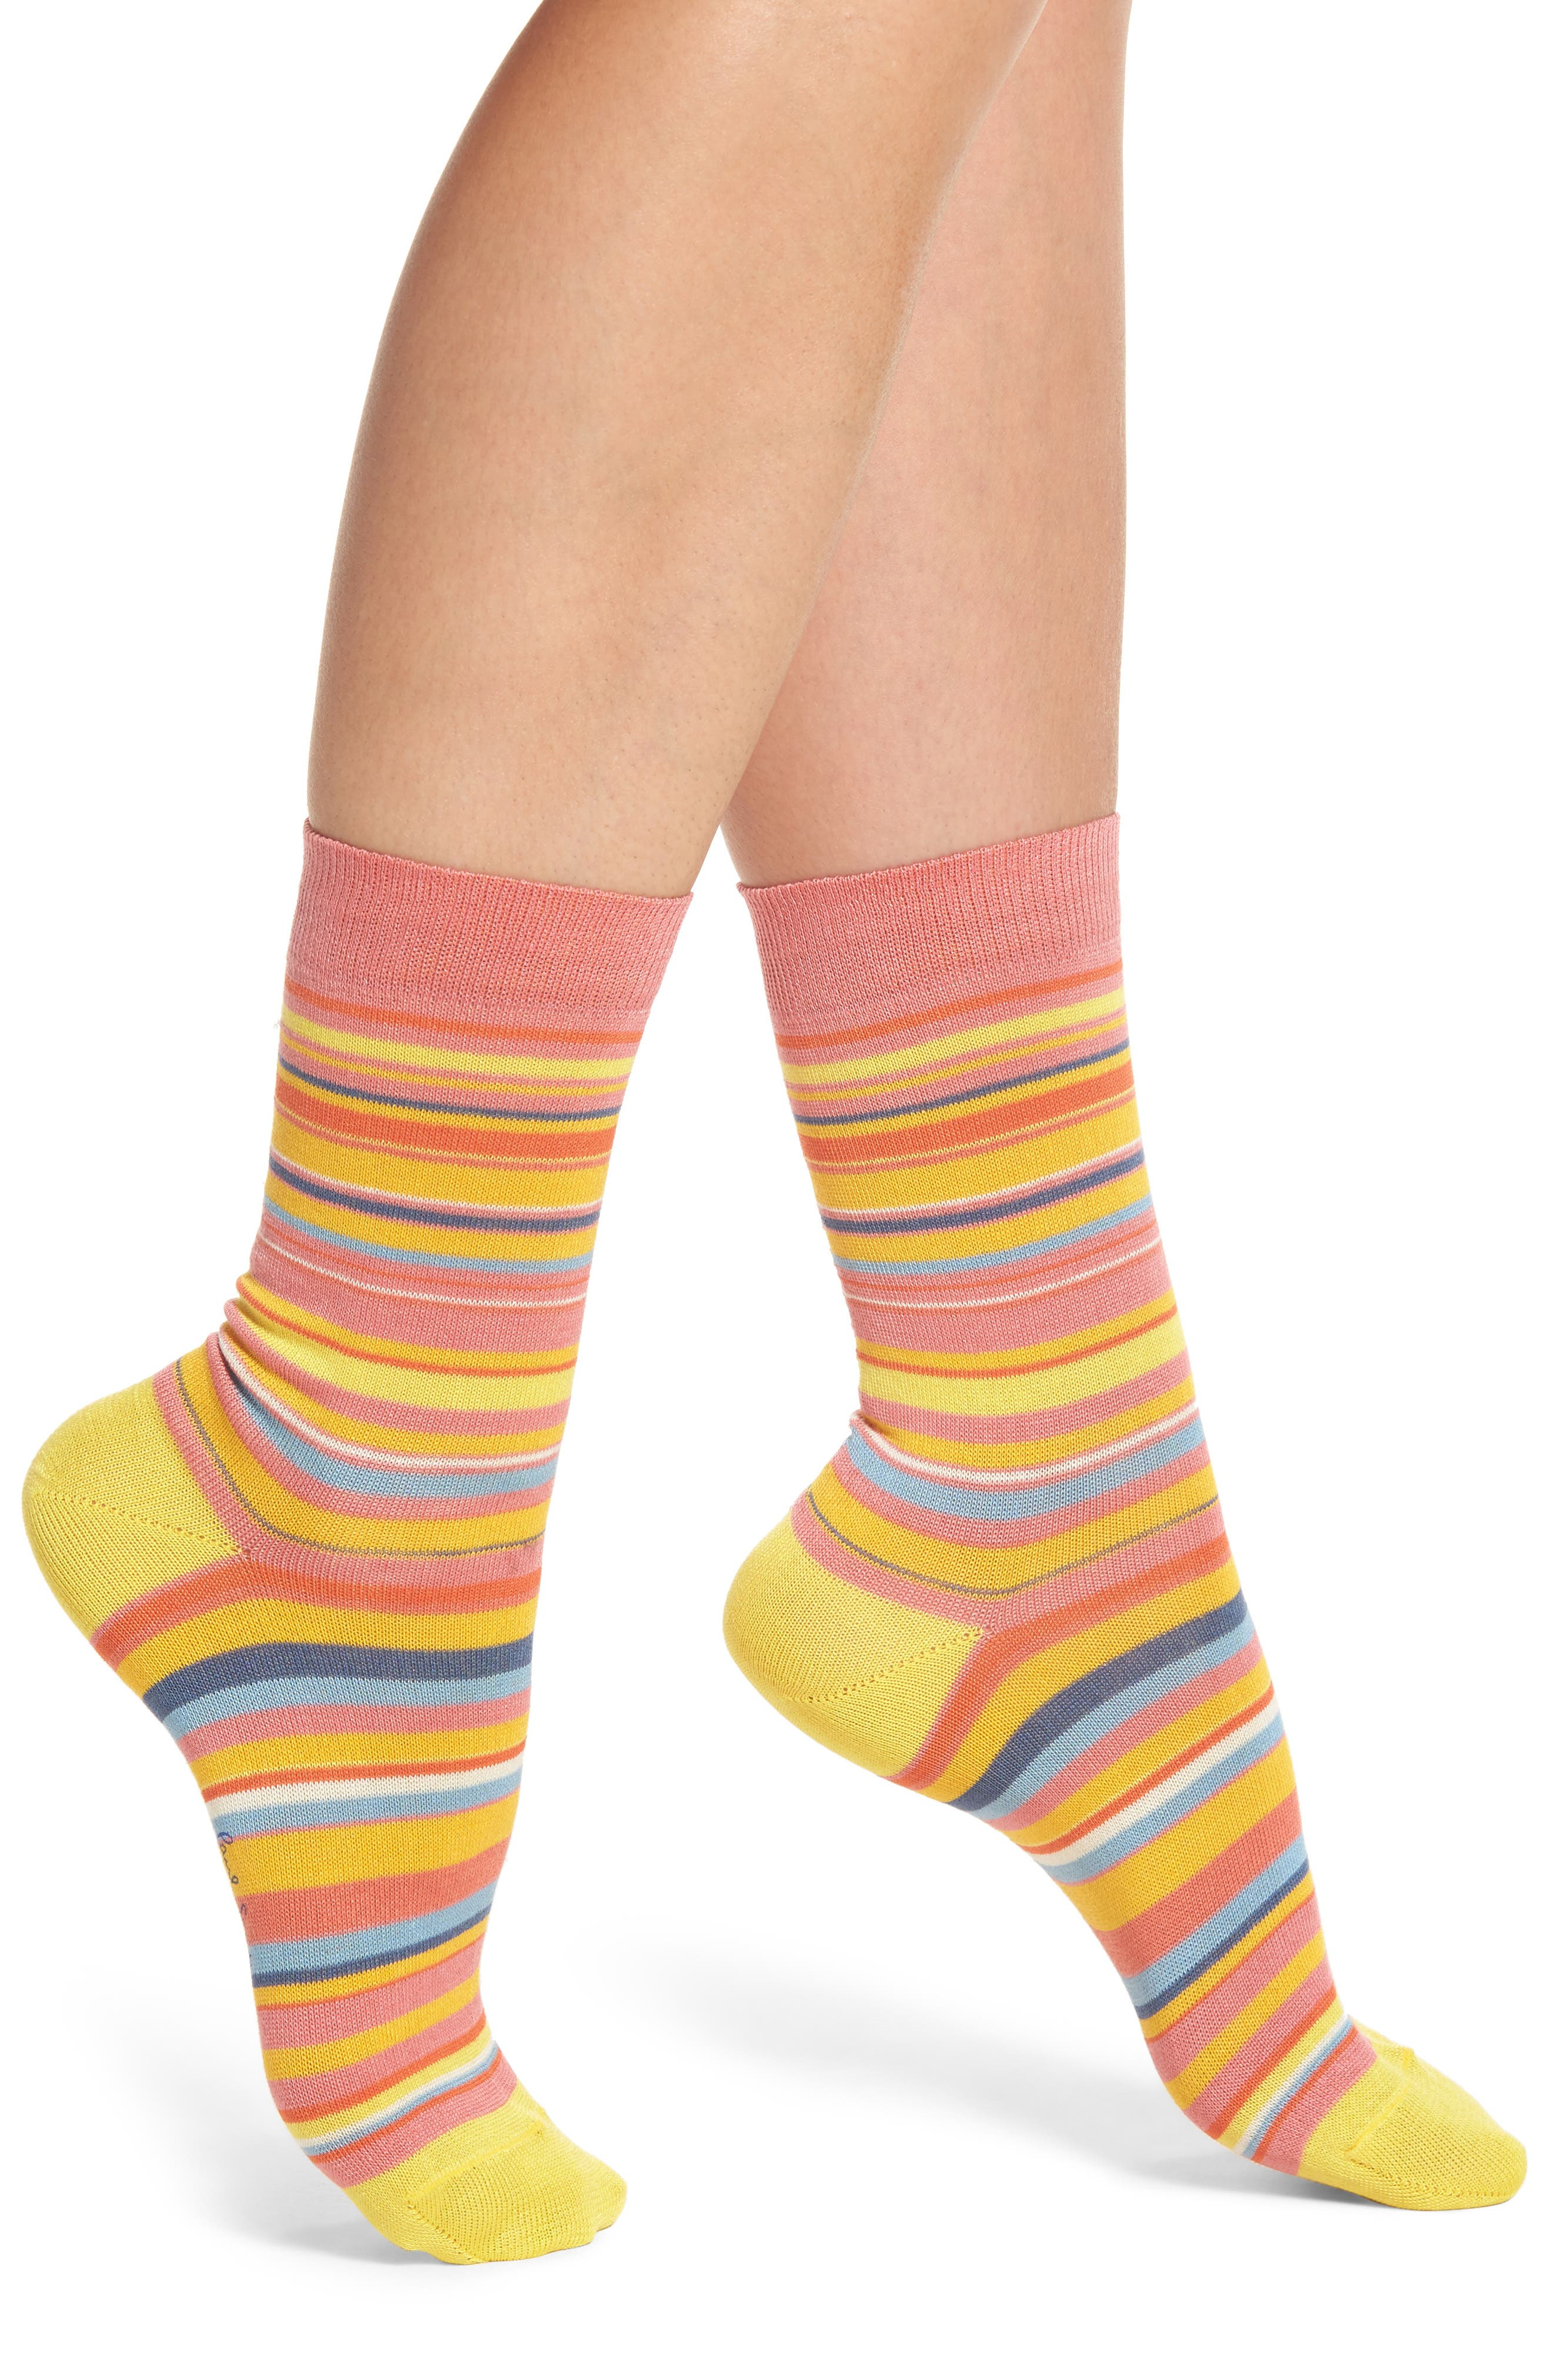 Fleur Crew Socks,                             Main thumbnail 1, color,                             700